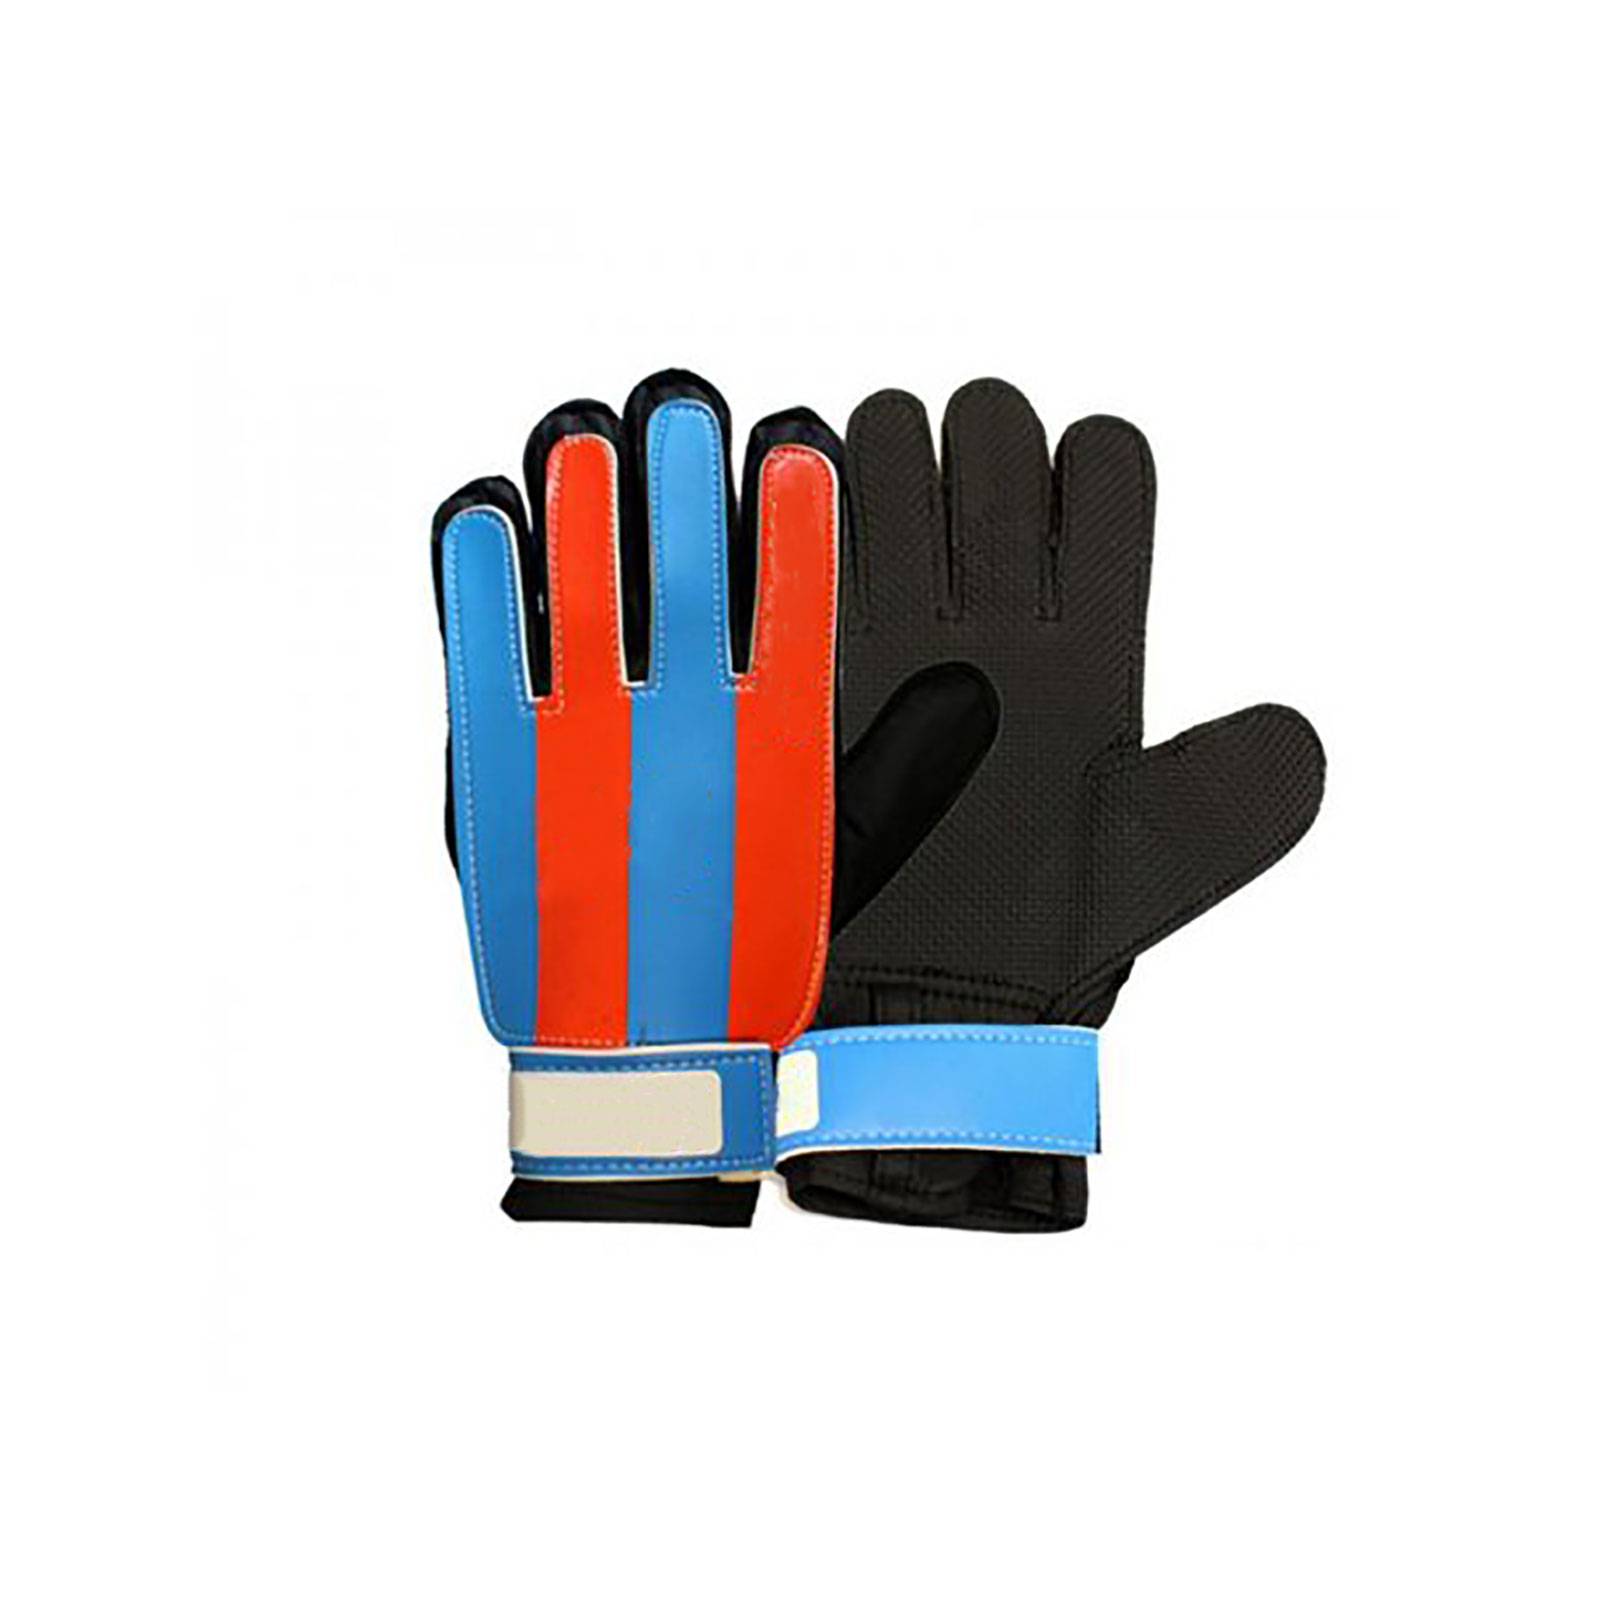 adult-sports-training-soccer-goalkeeper-gloves